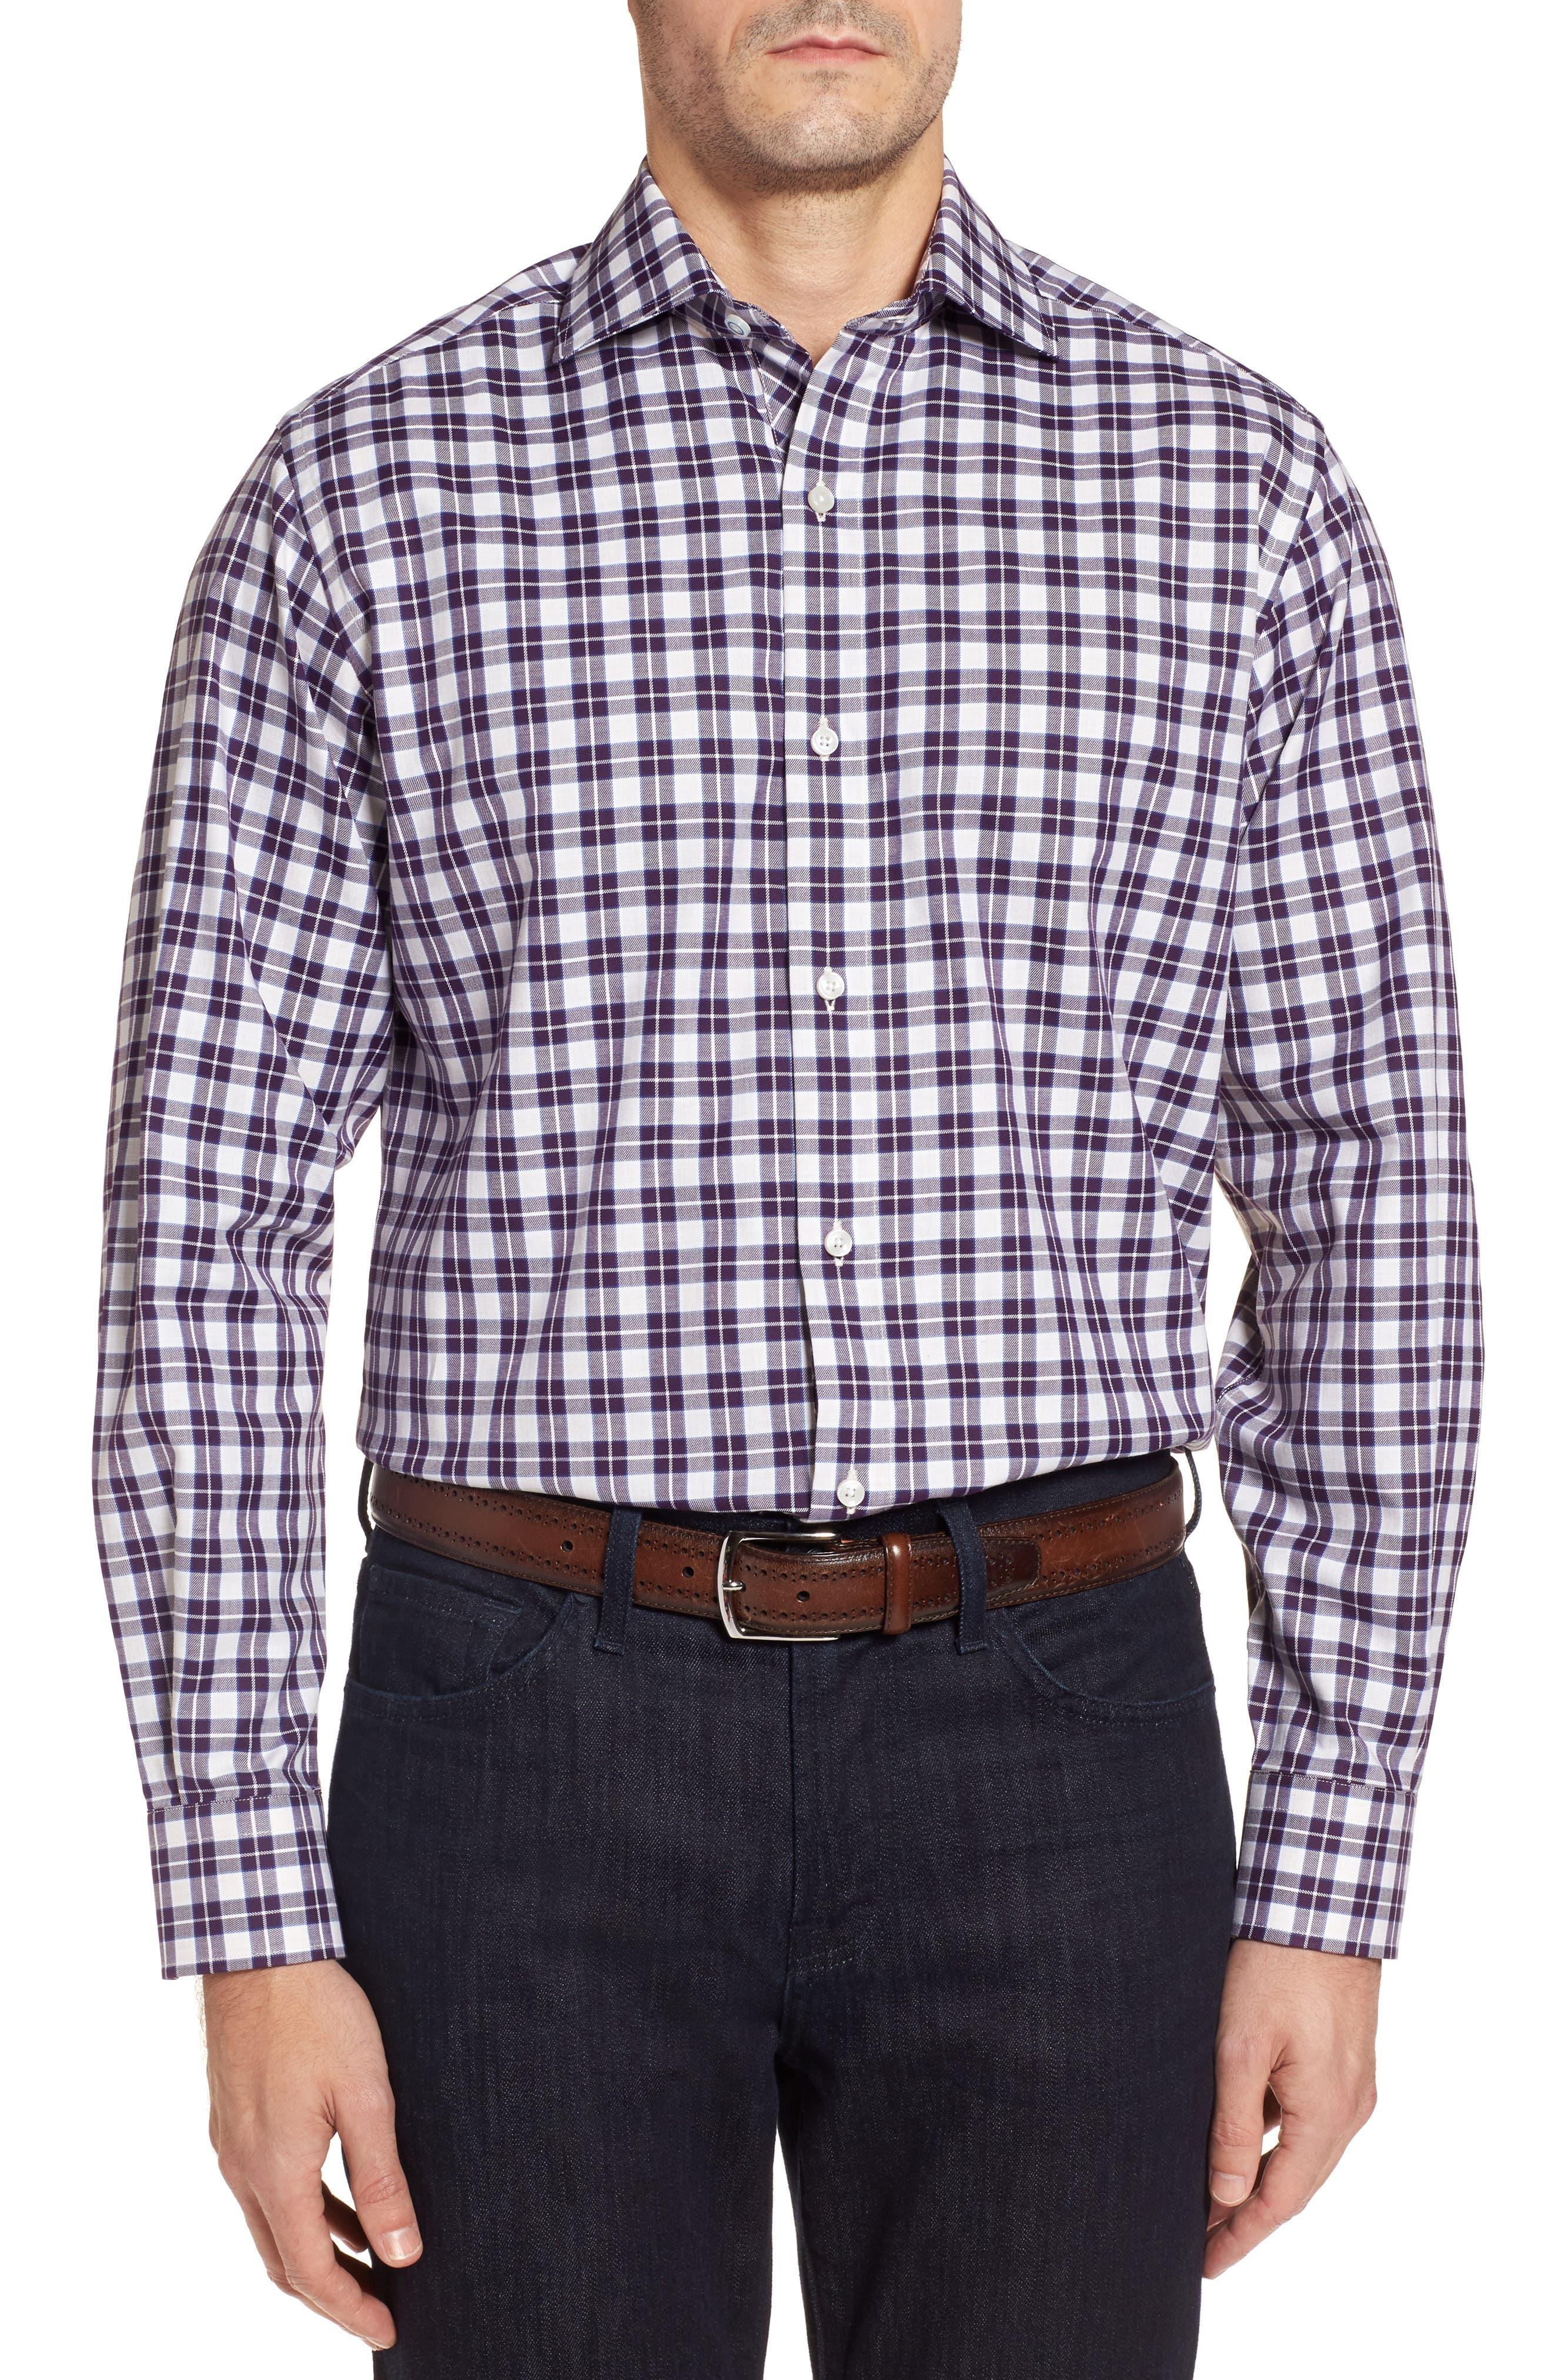 Main Image - TailorByrd Chalmette Check Twill Sport Shirt